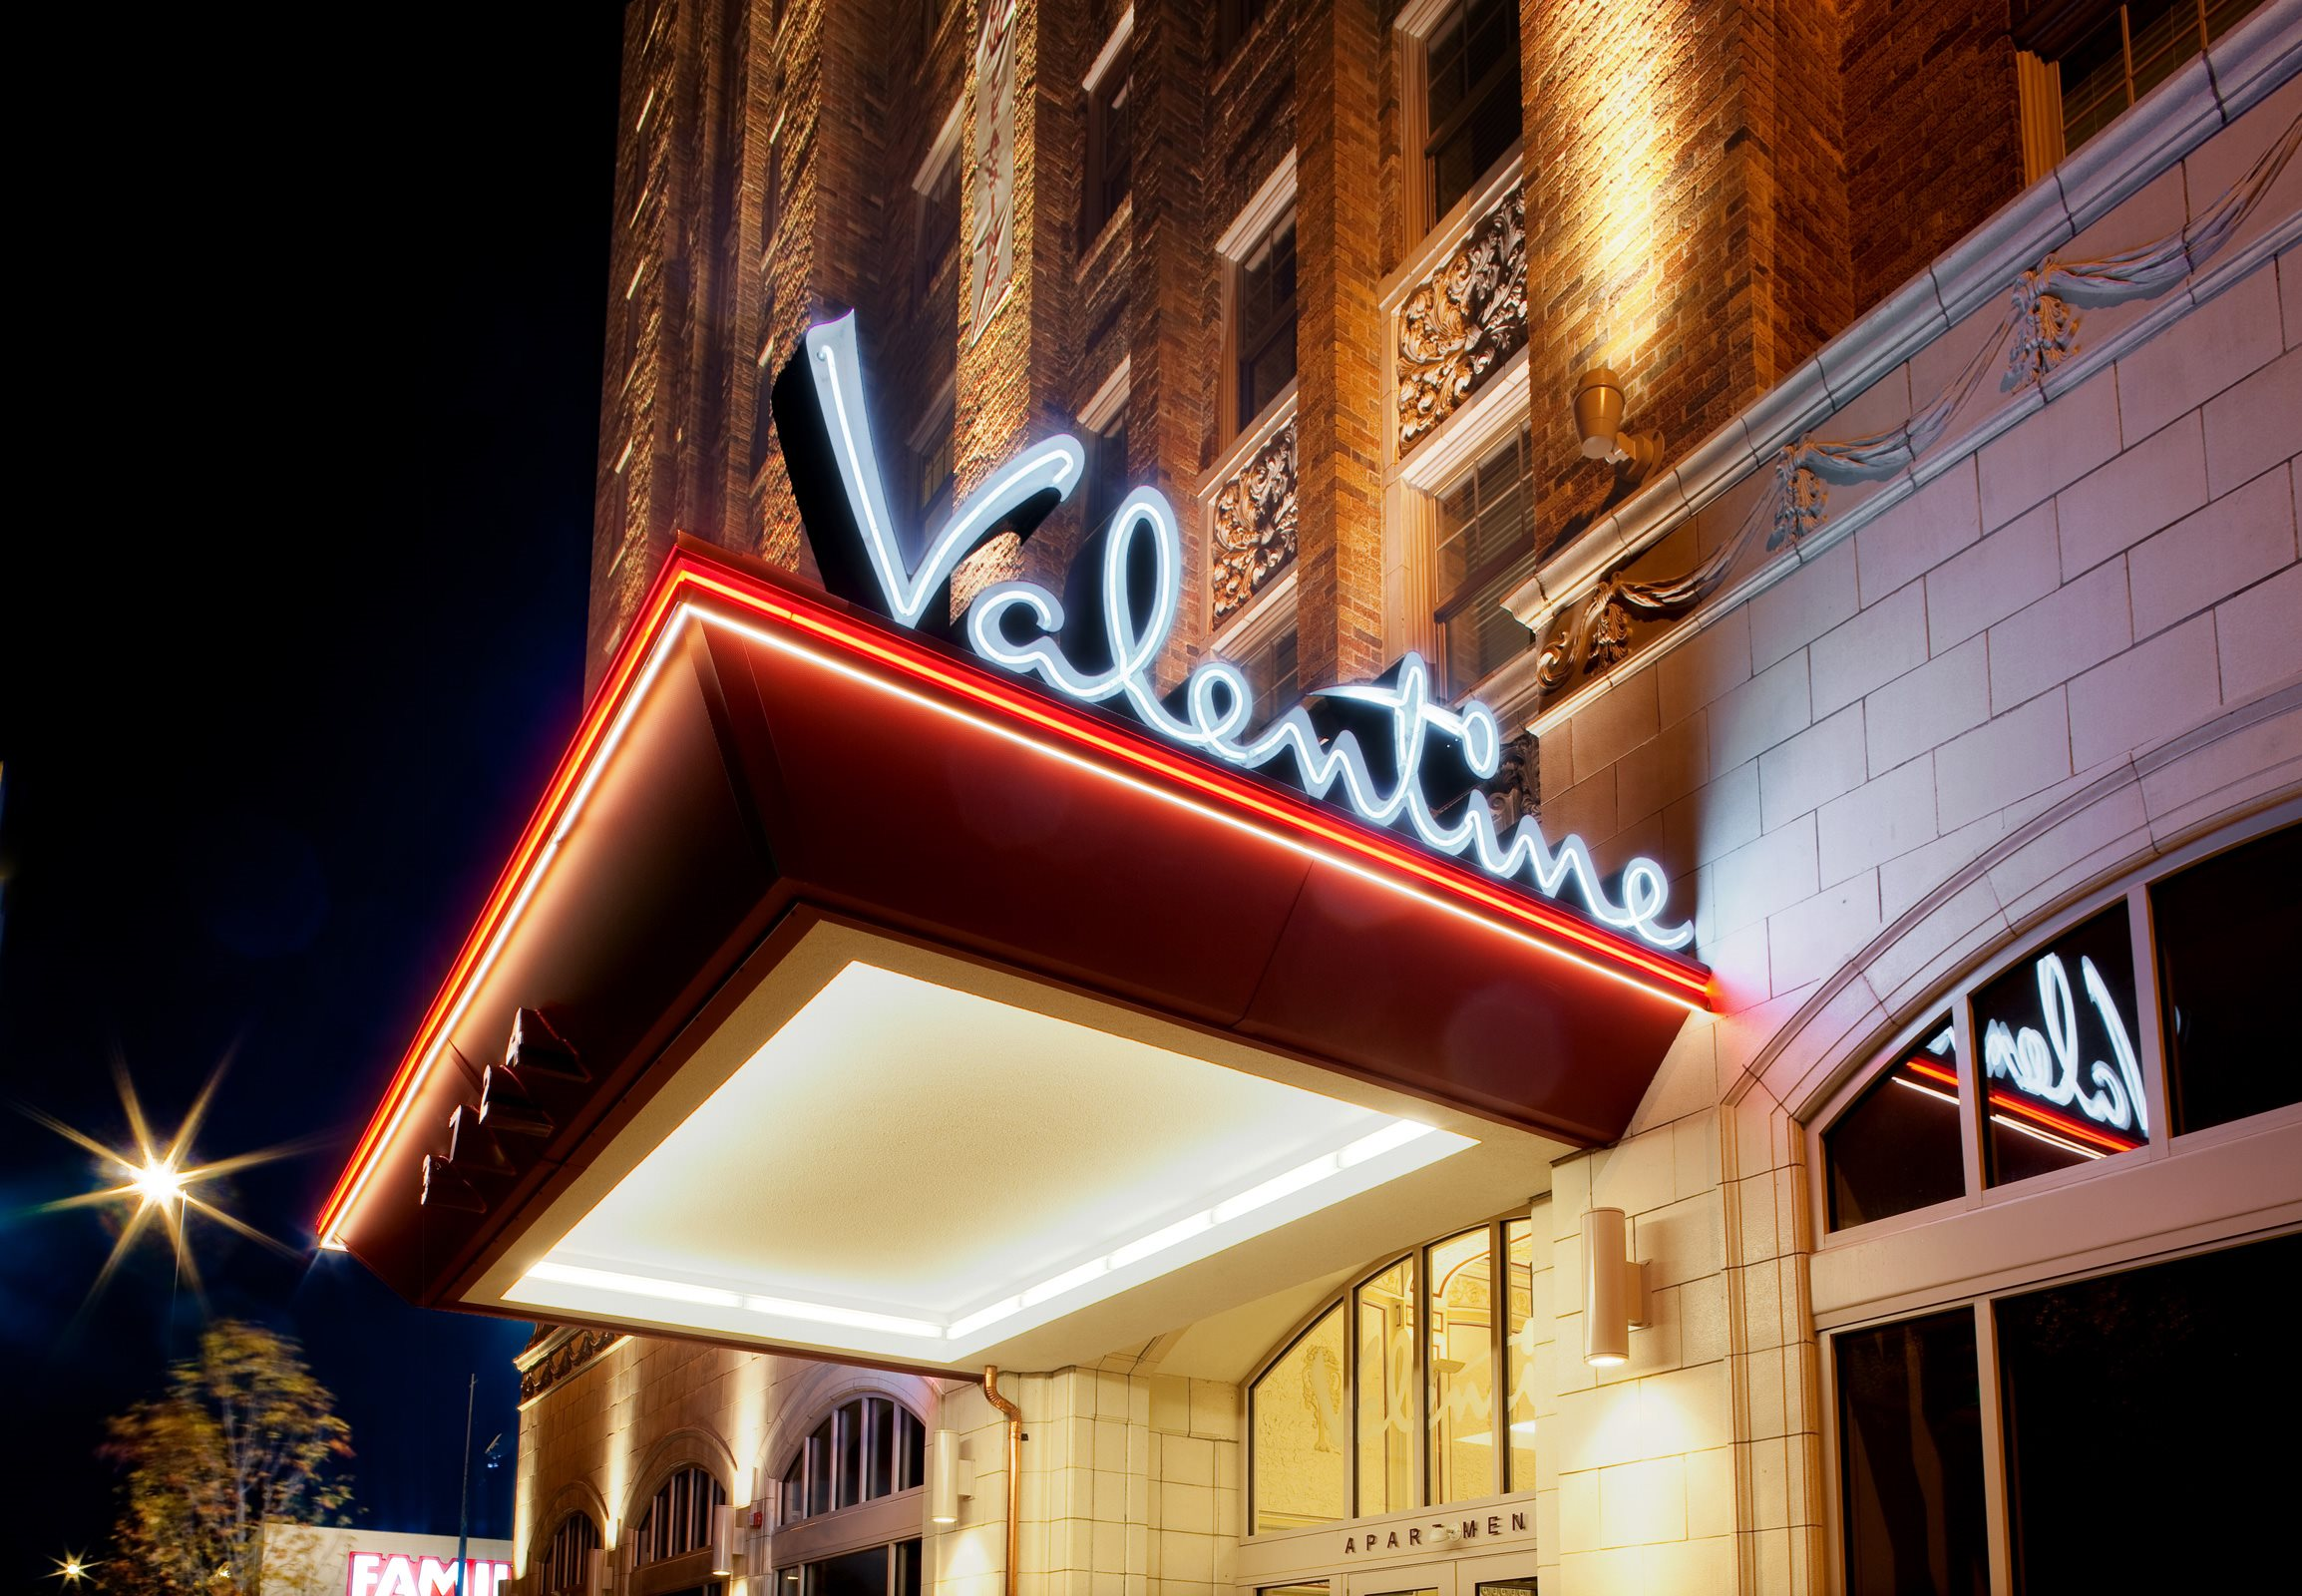 Neon property sign-Valentine Apartments, Kansas City, MO